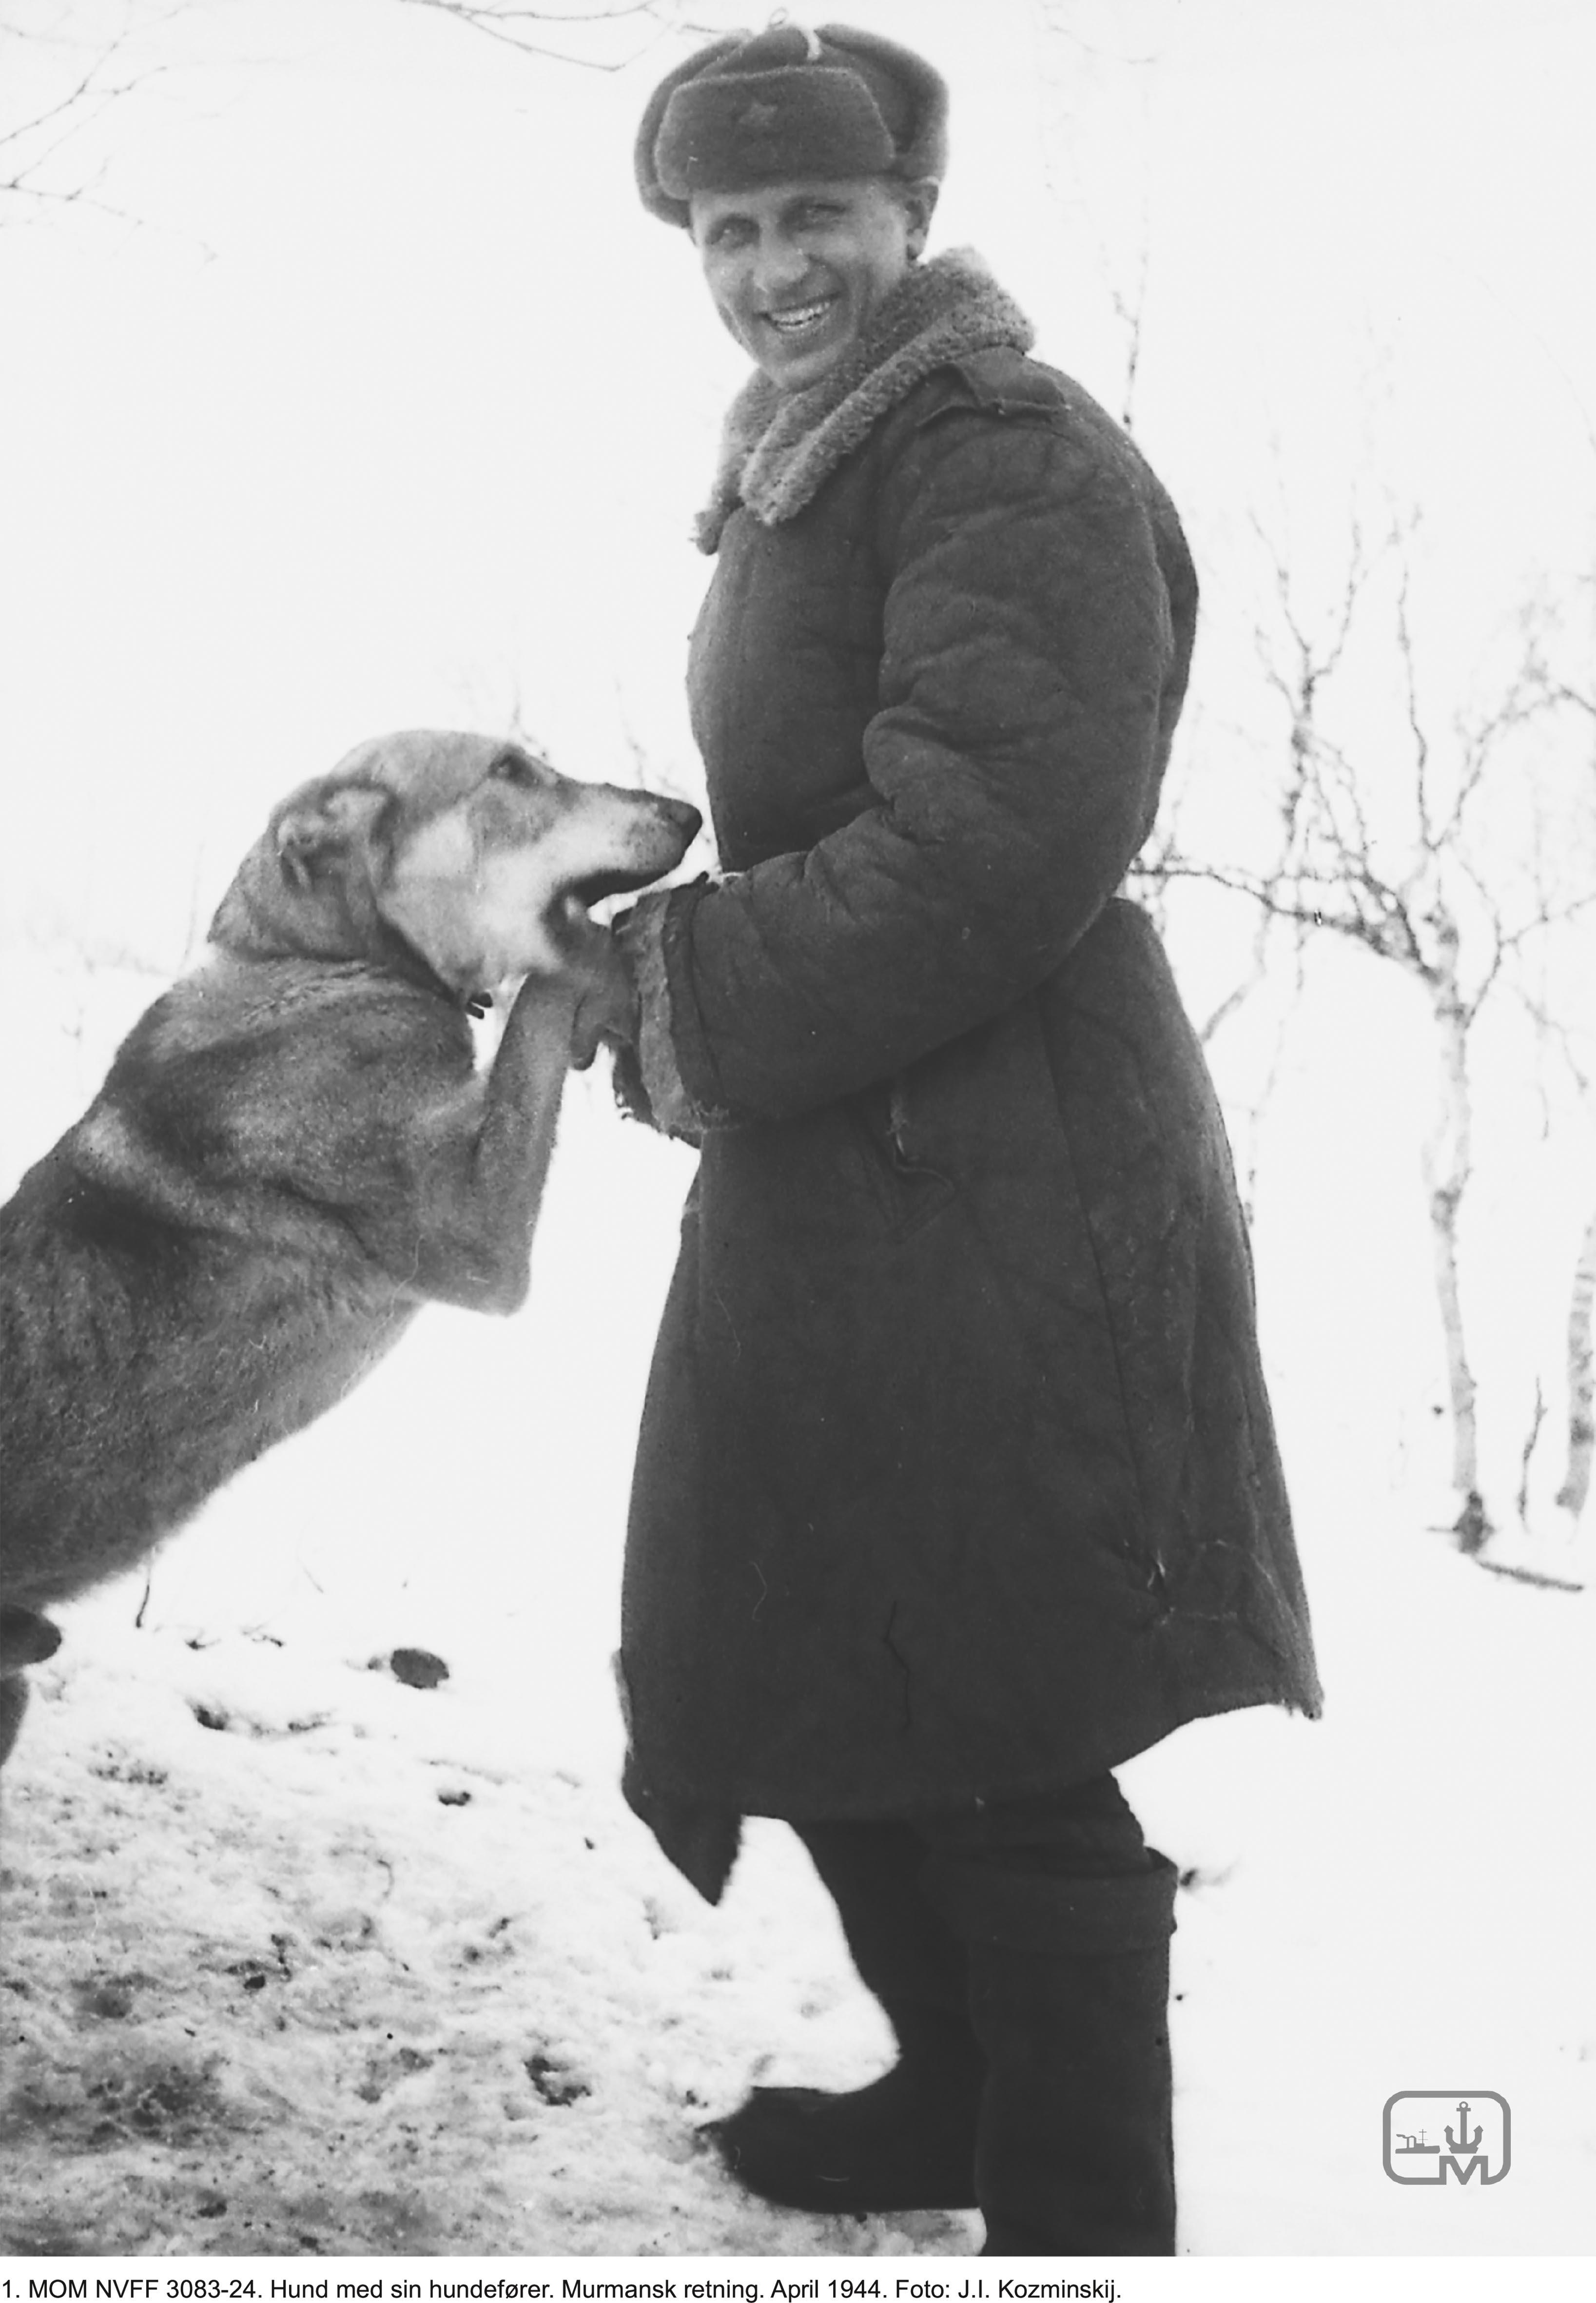 Pressebilde1-МОМ-NVFF-3083-24.-Hund-med-sin-hundefører.-Murmansk-retning.-April-1944.-Foto-J.I.-Kozminskij-1.jpg